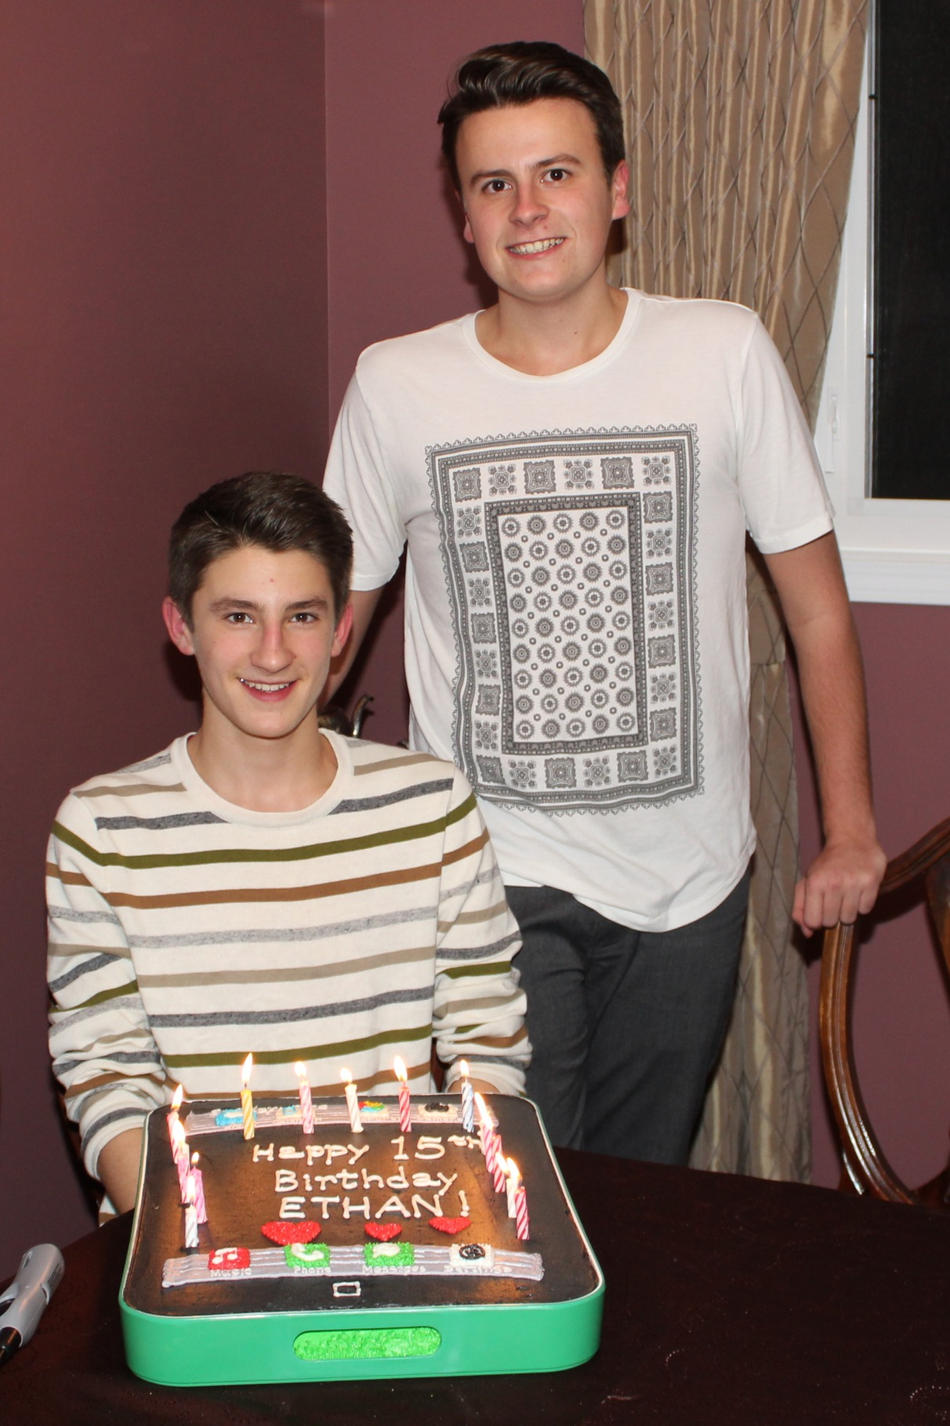 2013 Ethan turns 15